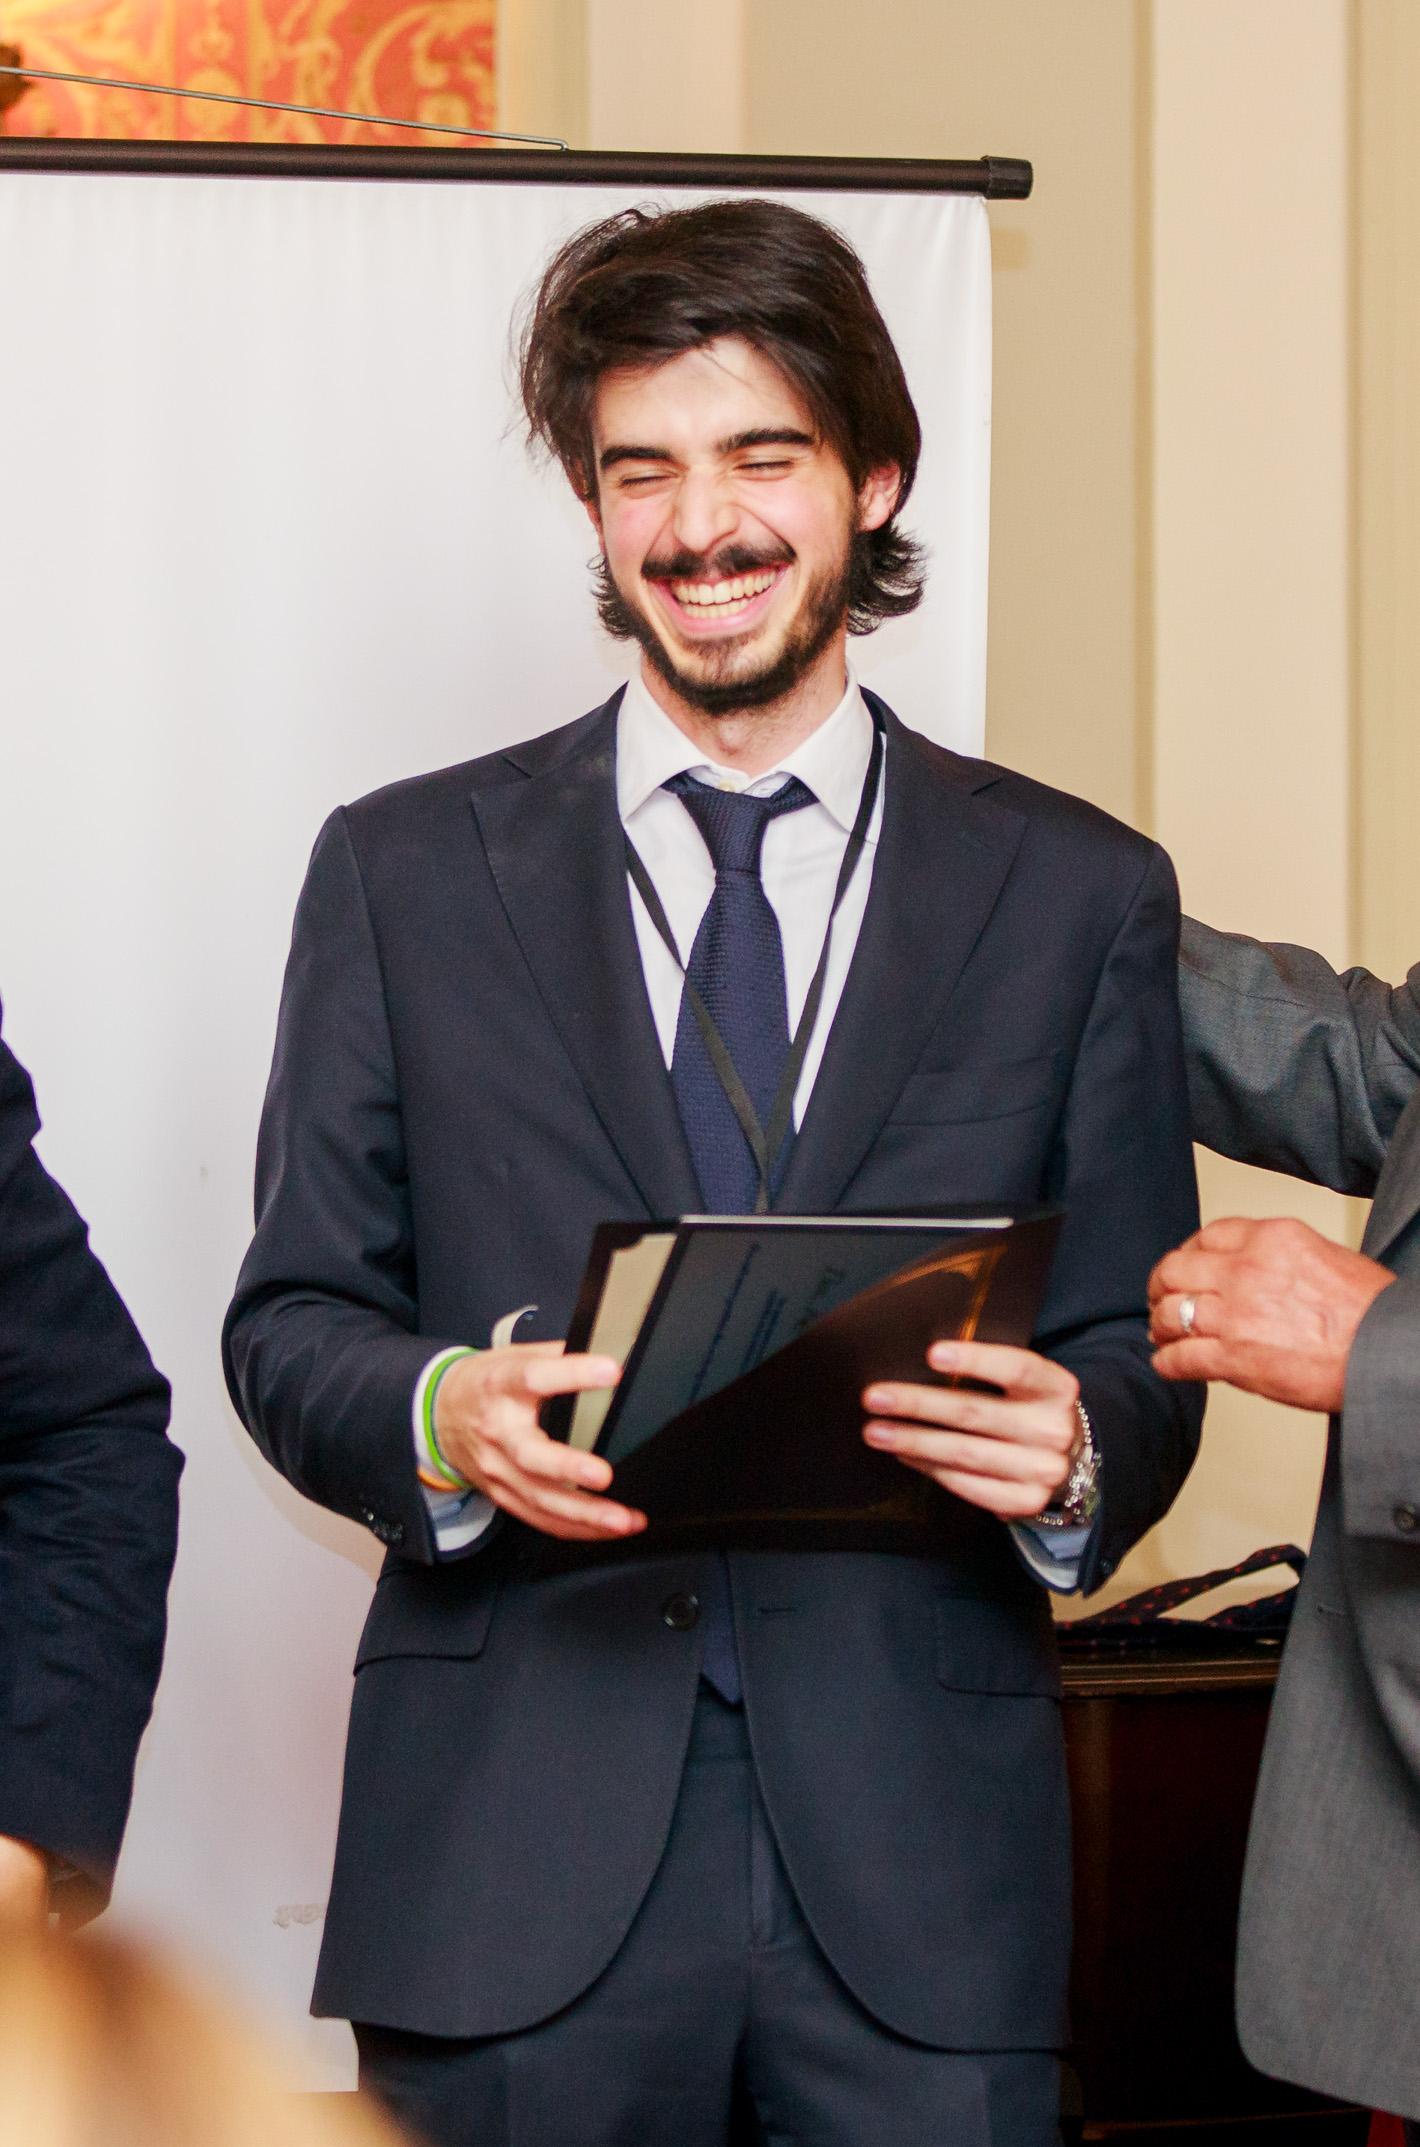 163-DIPLOMAS - World Jurist Association